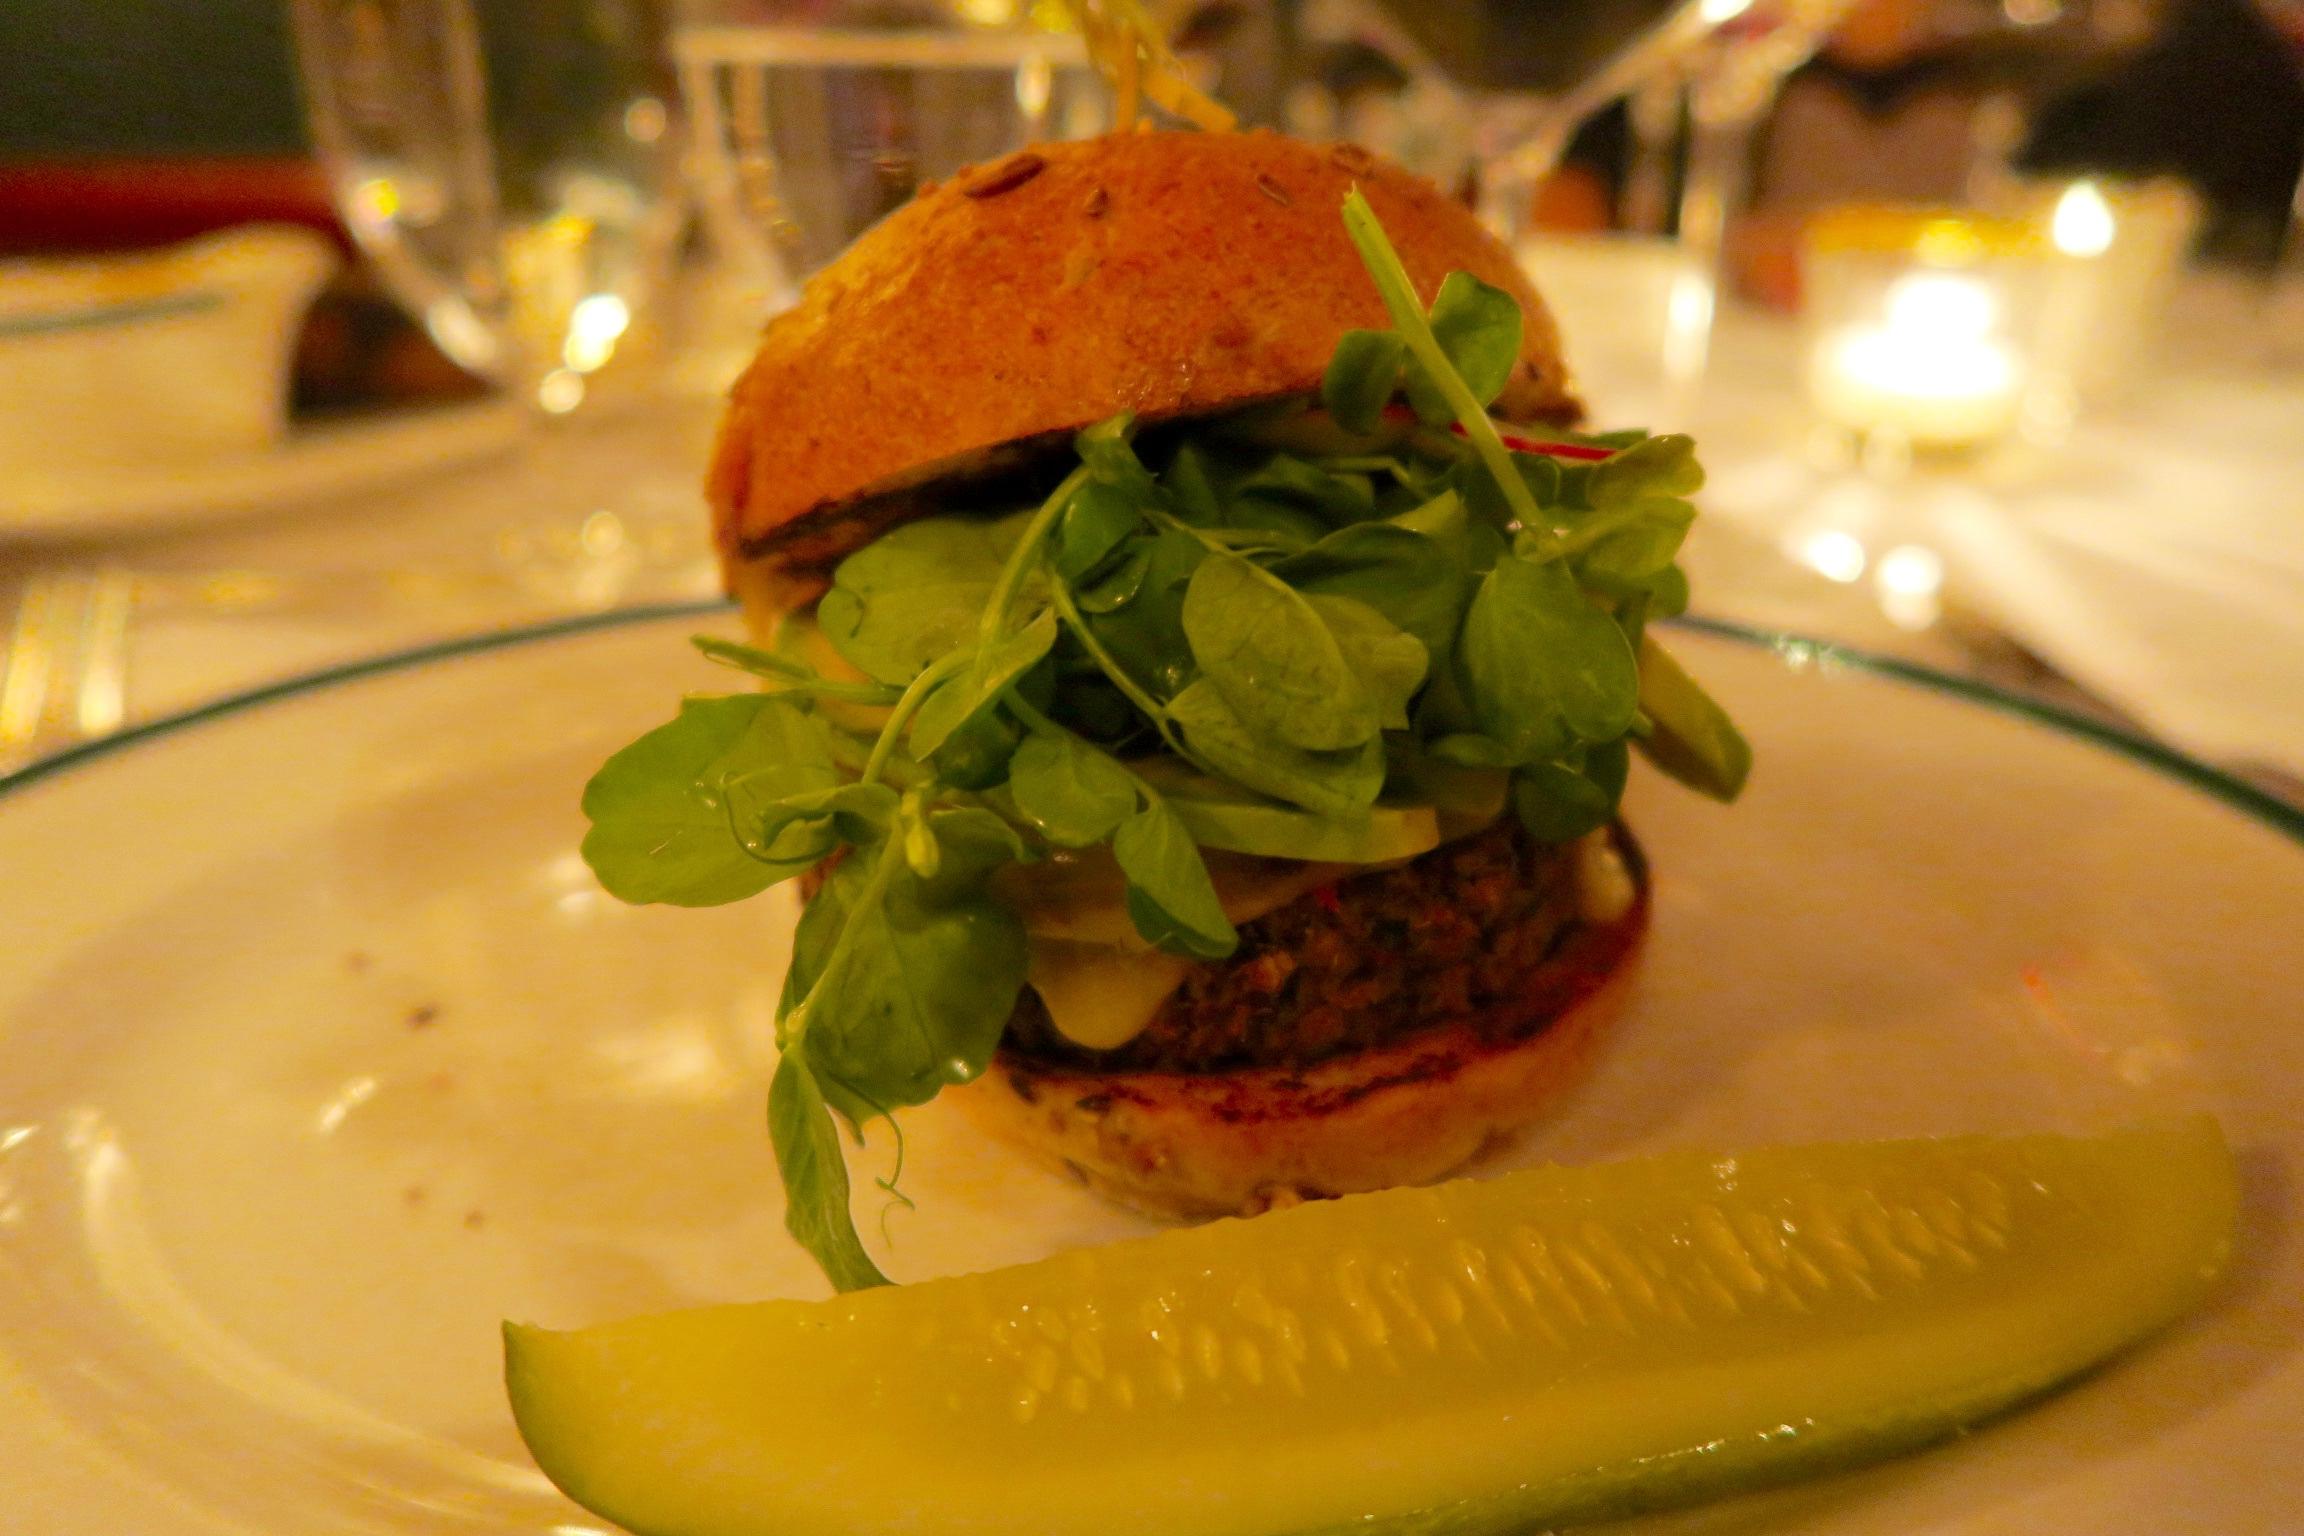 Veggie Burger  Avocado, Heirloom Tomato, Pepper Jack Cheese, and Barbecue Sauce